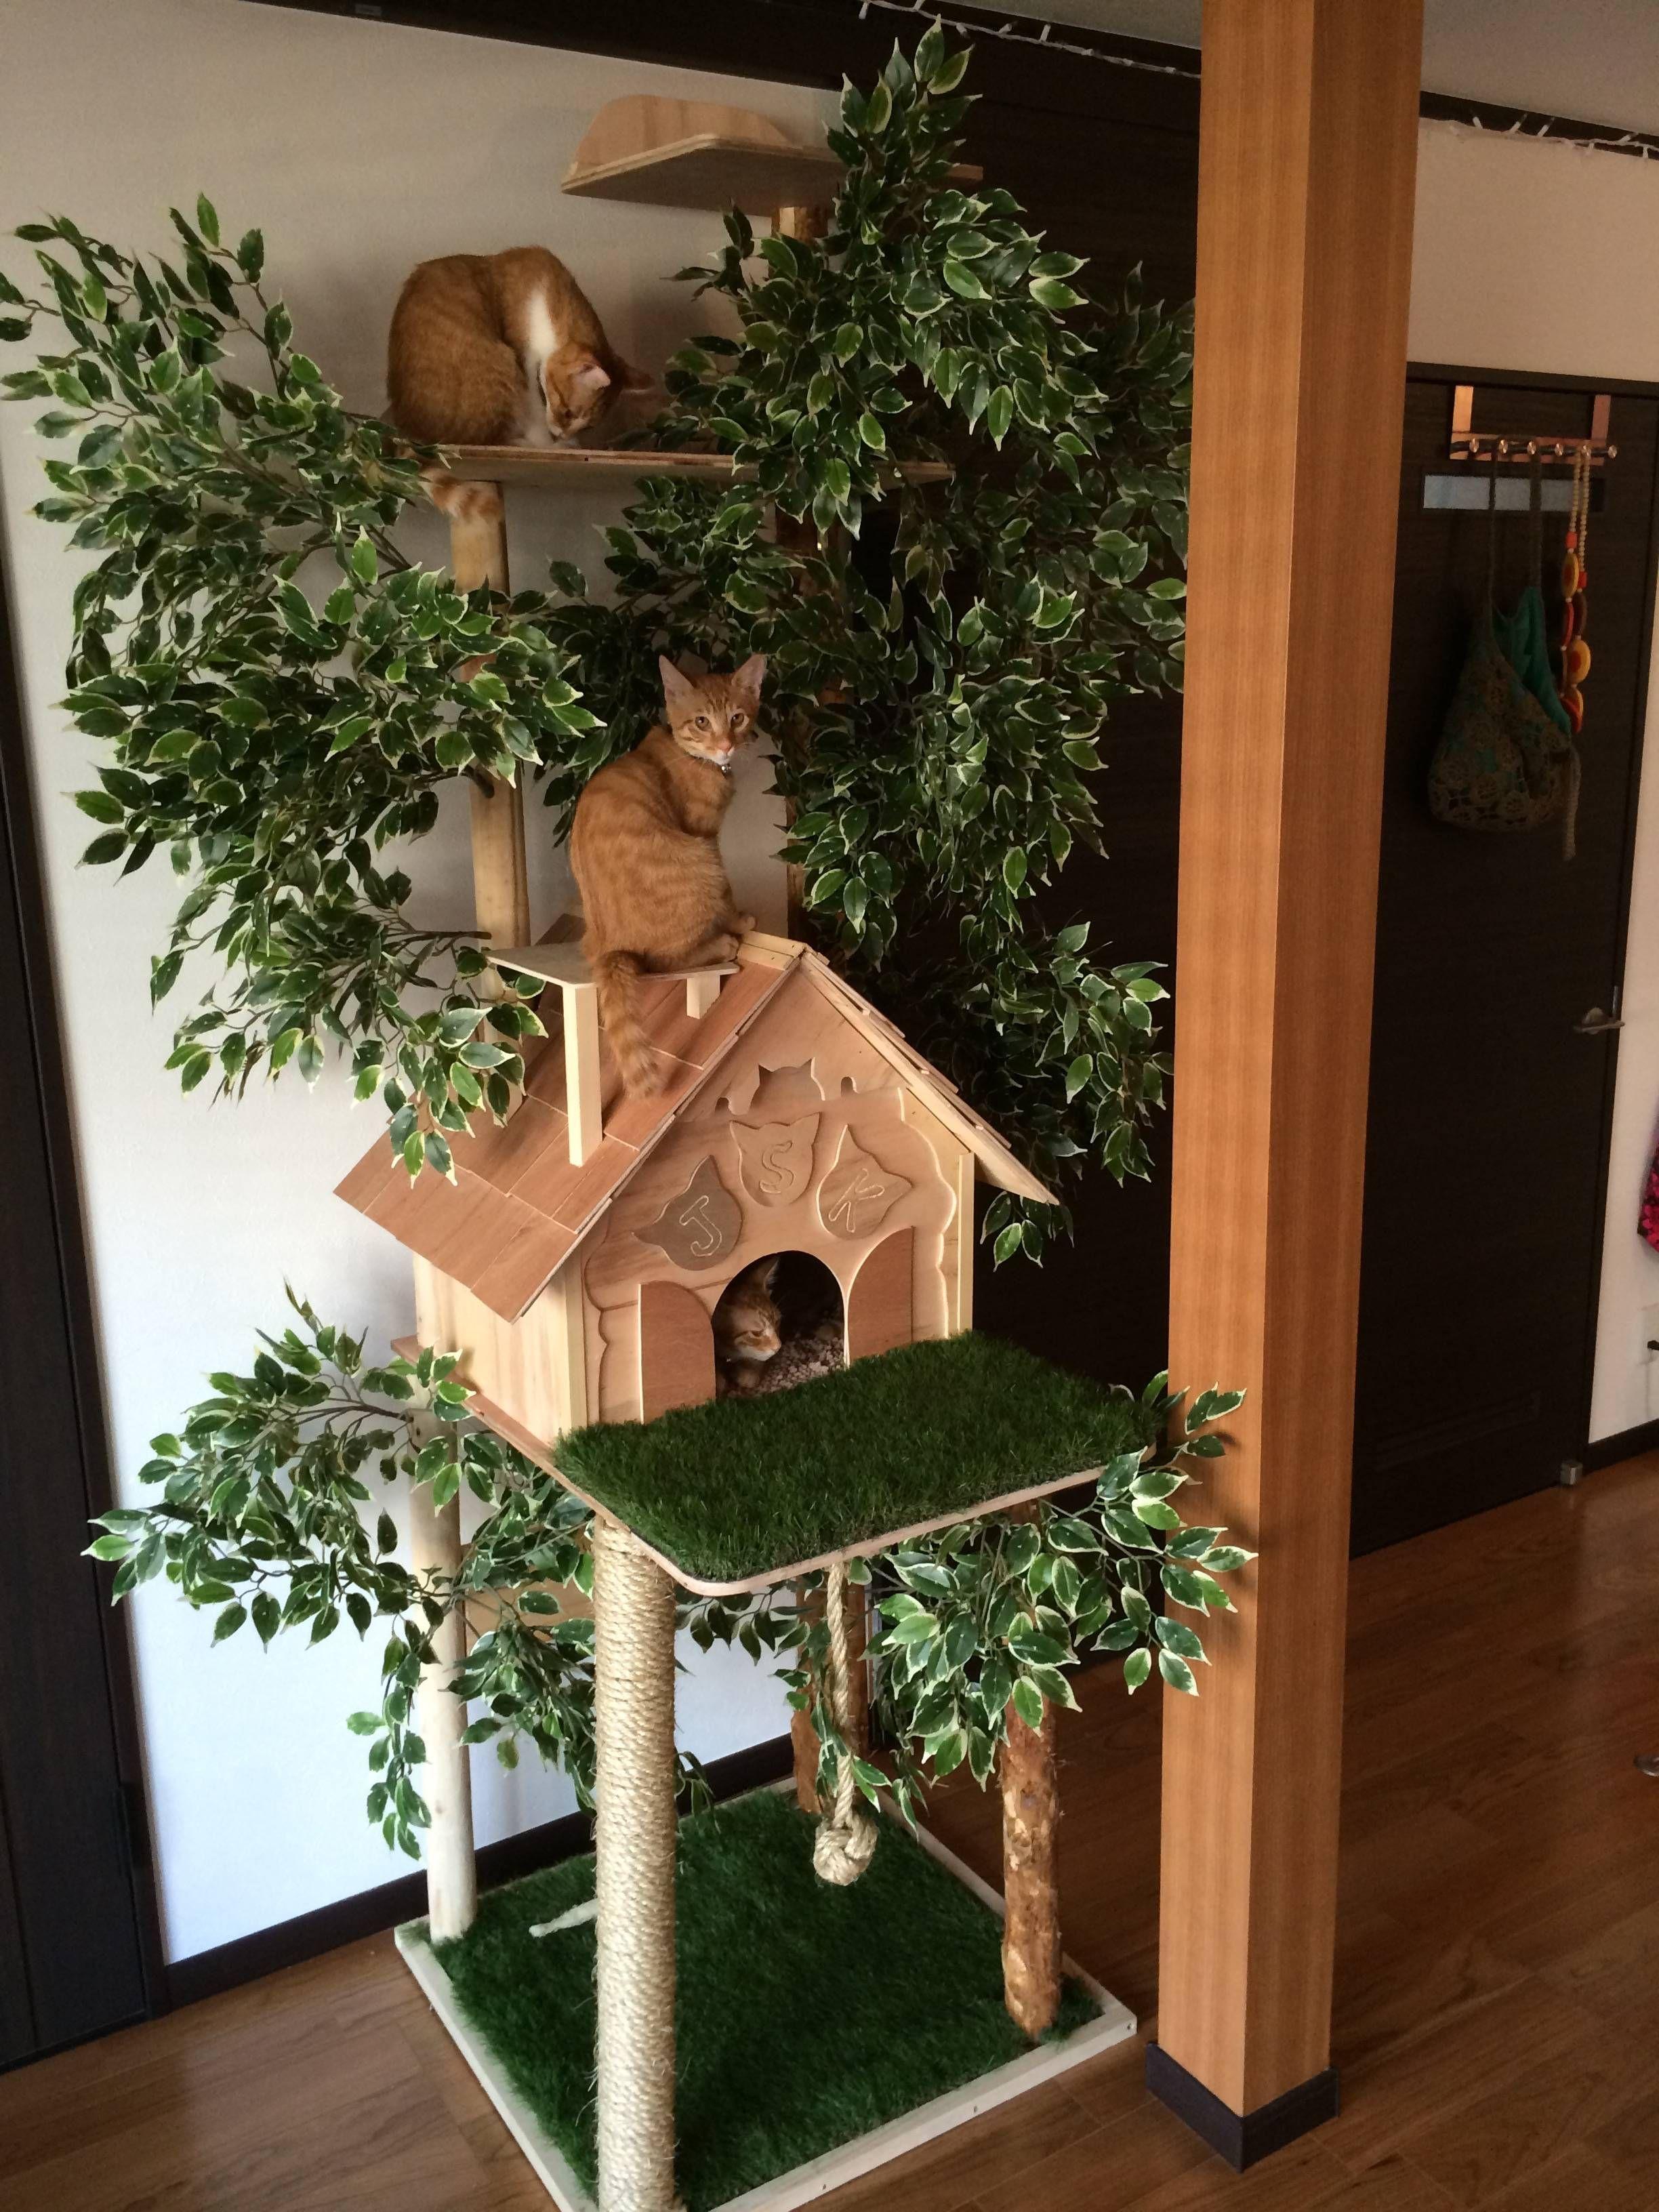 Making A Natural Looking Cat Tree Diy Cat Tree Cat House Diy Cat Tree Designs